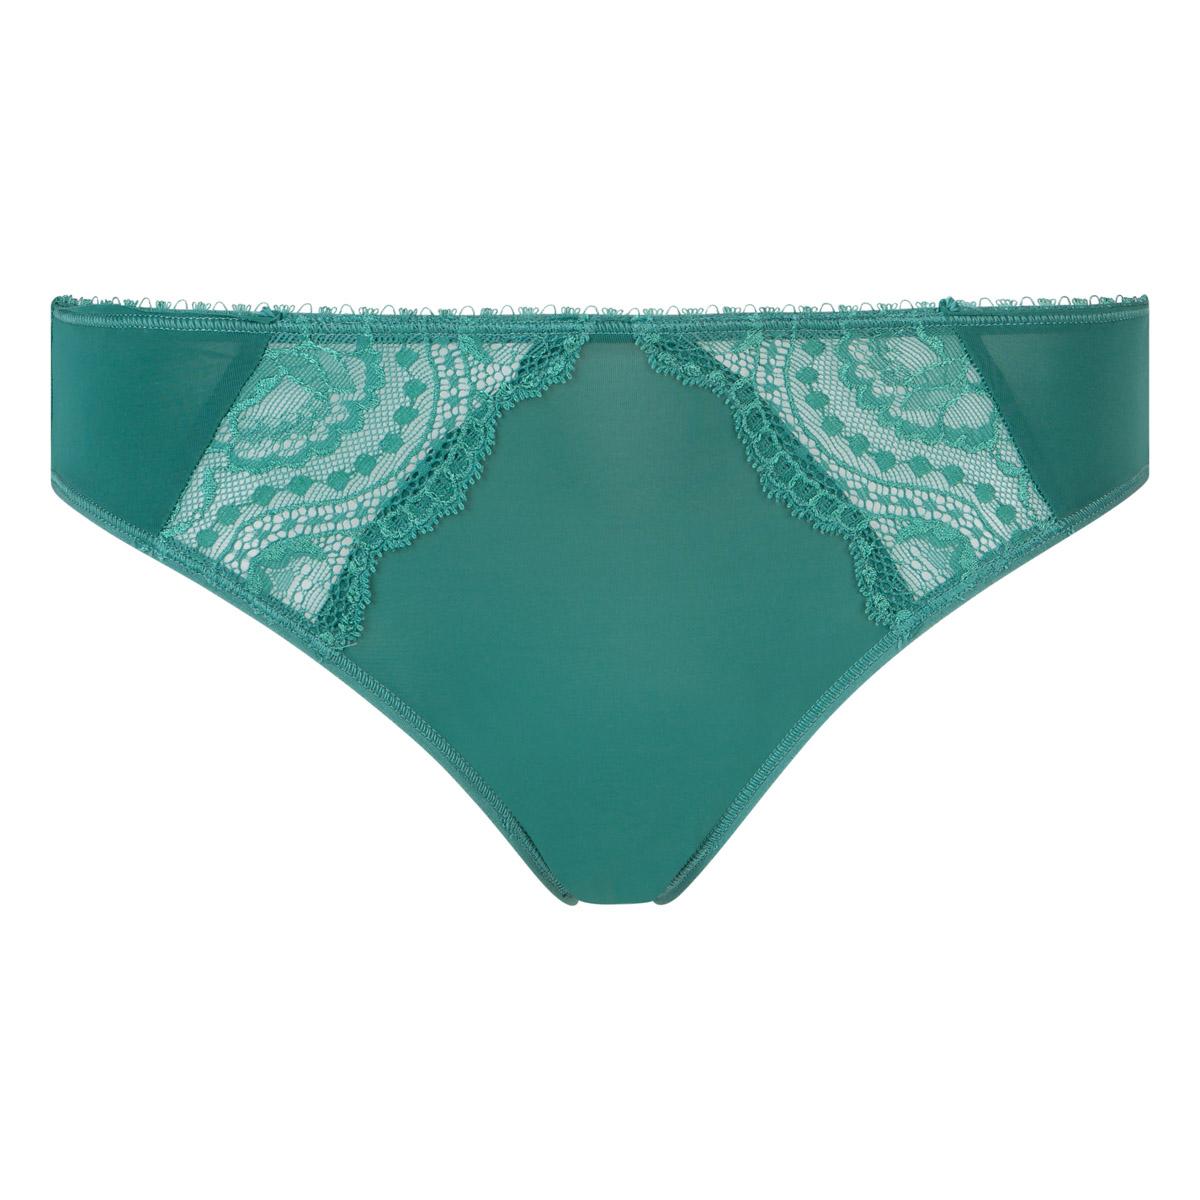 Culotte mini vert foncé Flower Elegance, , PLAYTEX